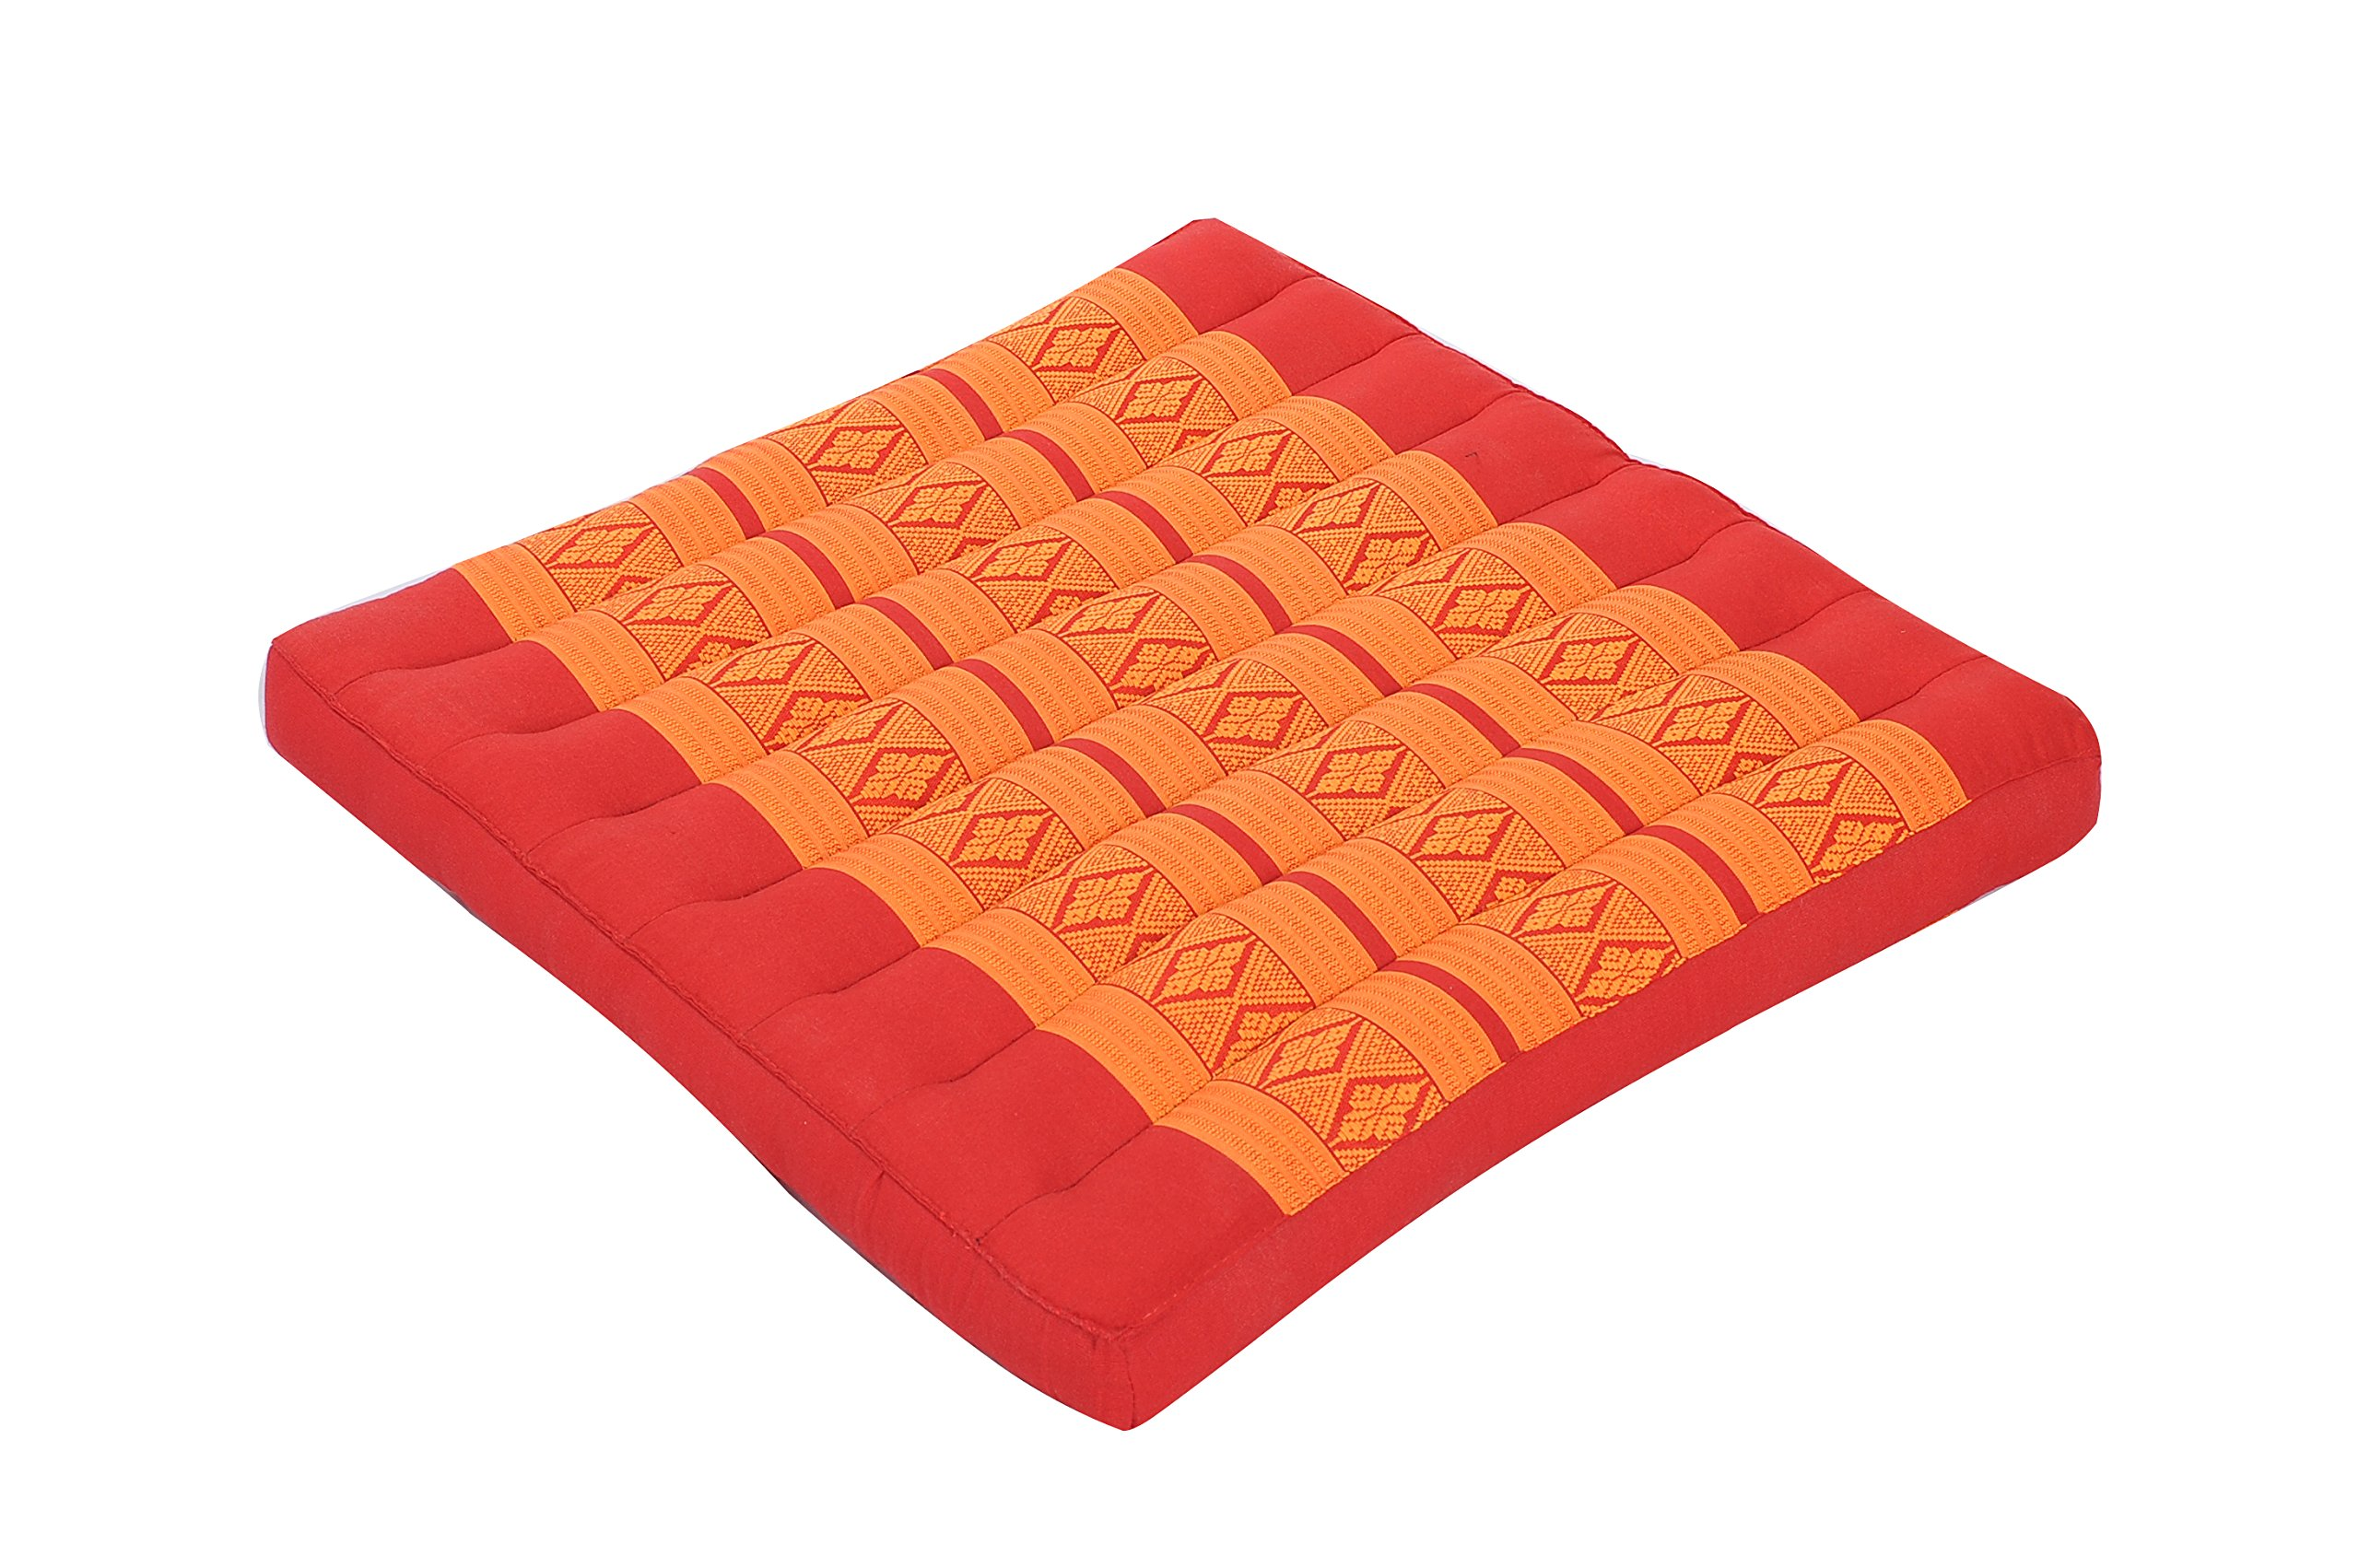 Kapok Dreams Seat Cushion 20''x20''x2'', Thai Design Orange & Red, Firm Natural Kapok Filling, Great as Floor Pillow Meditation Zabuton by Kapok Dreams